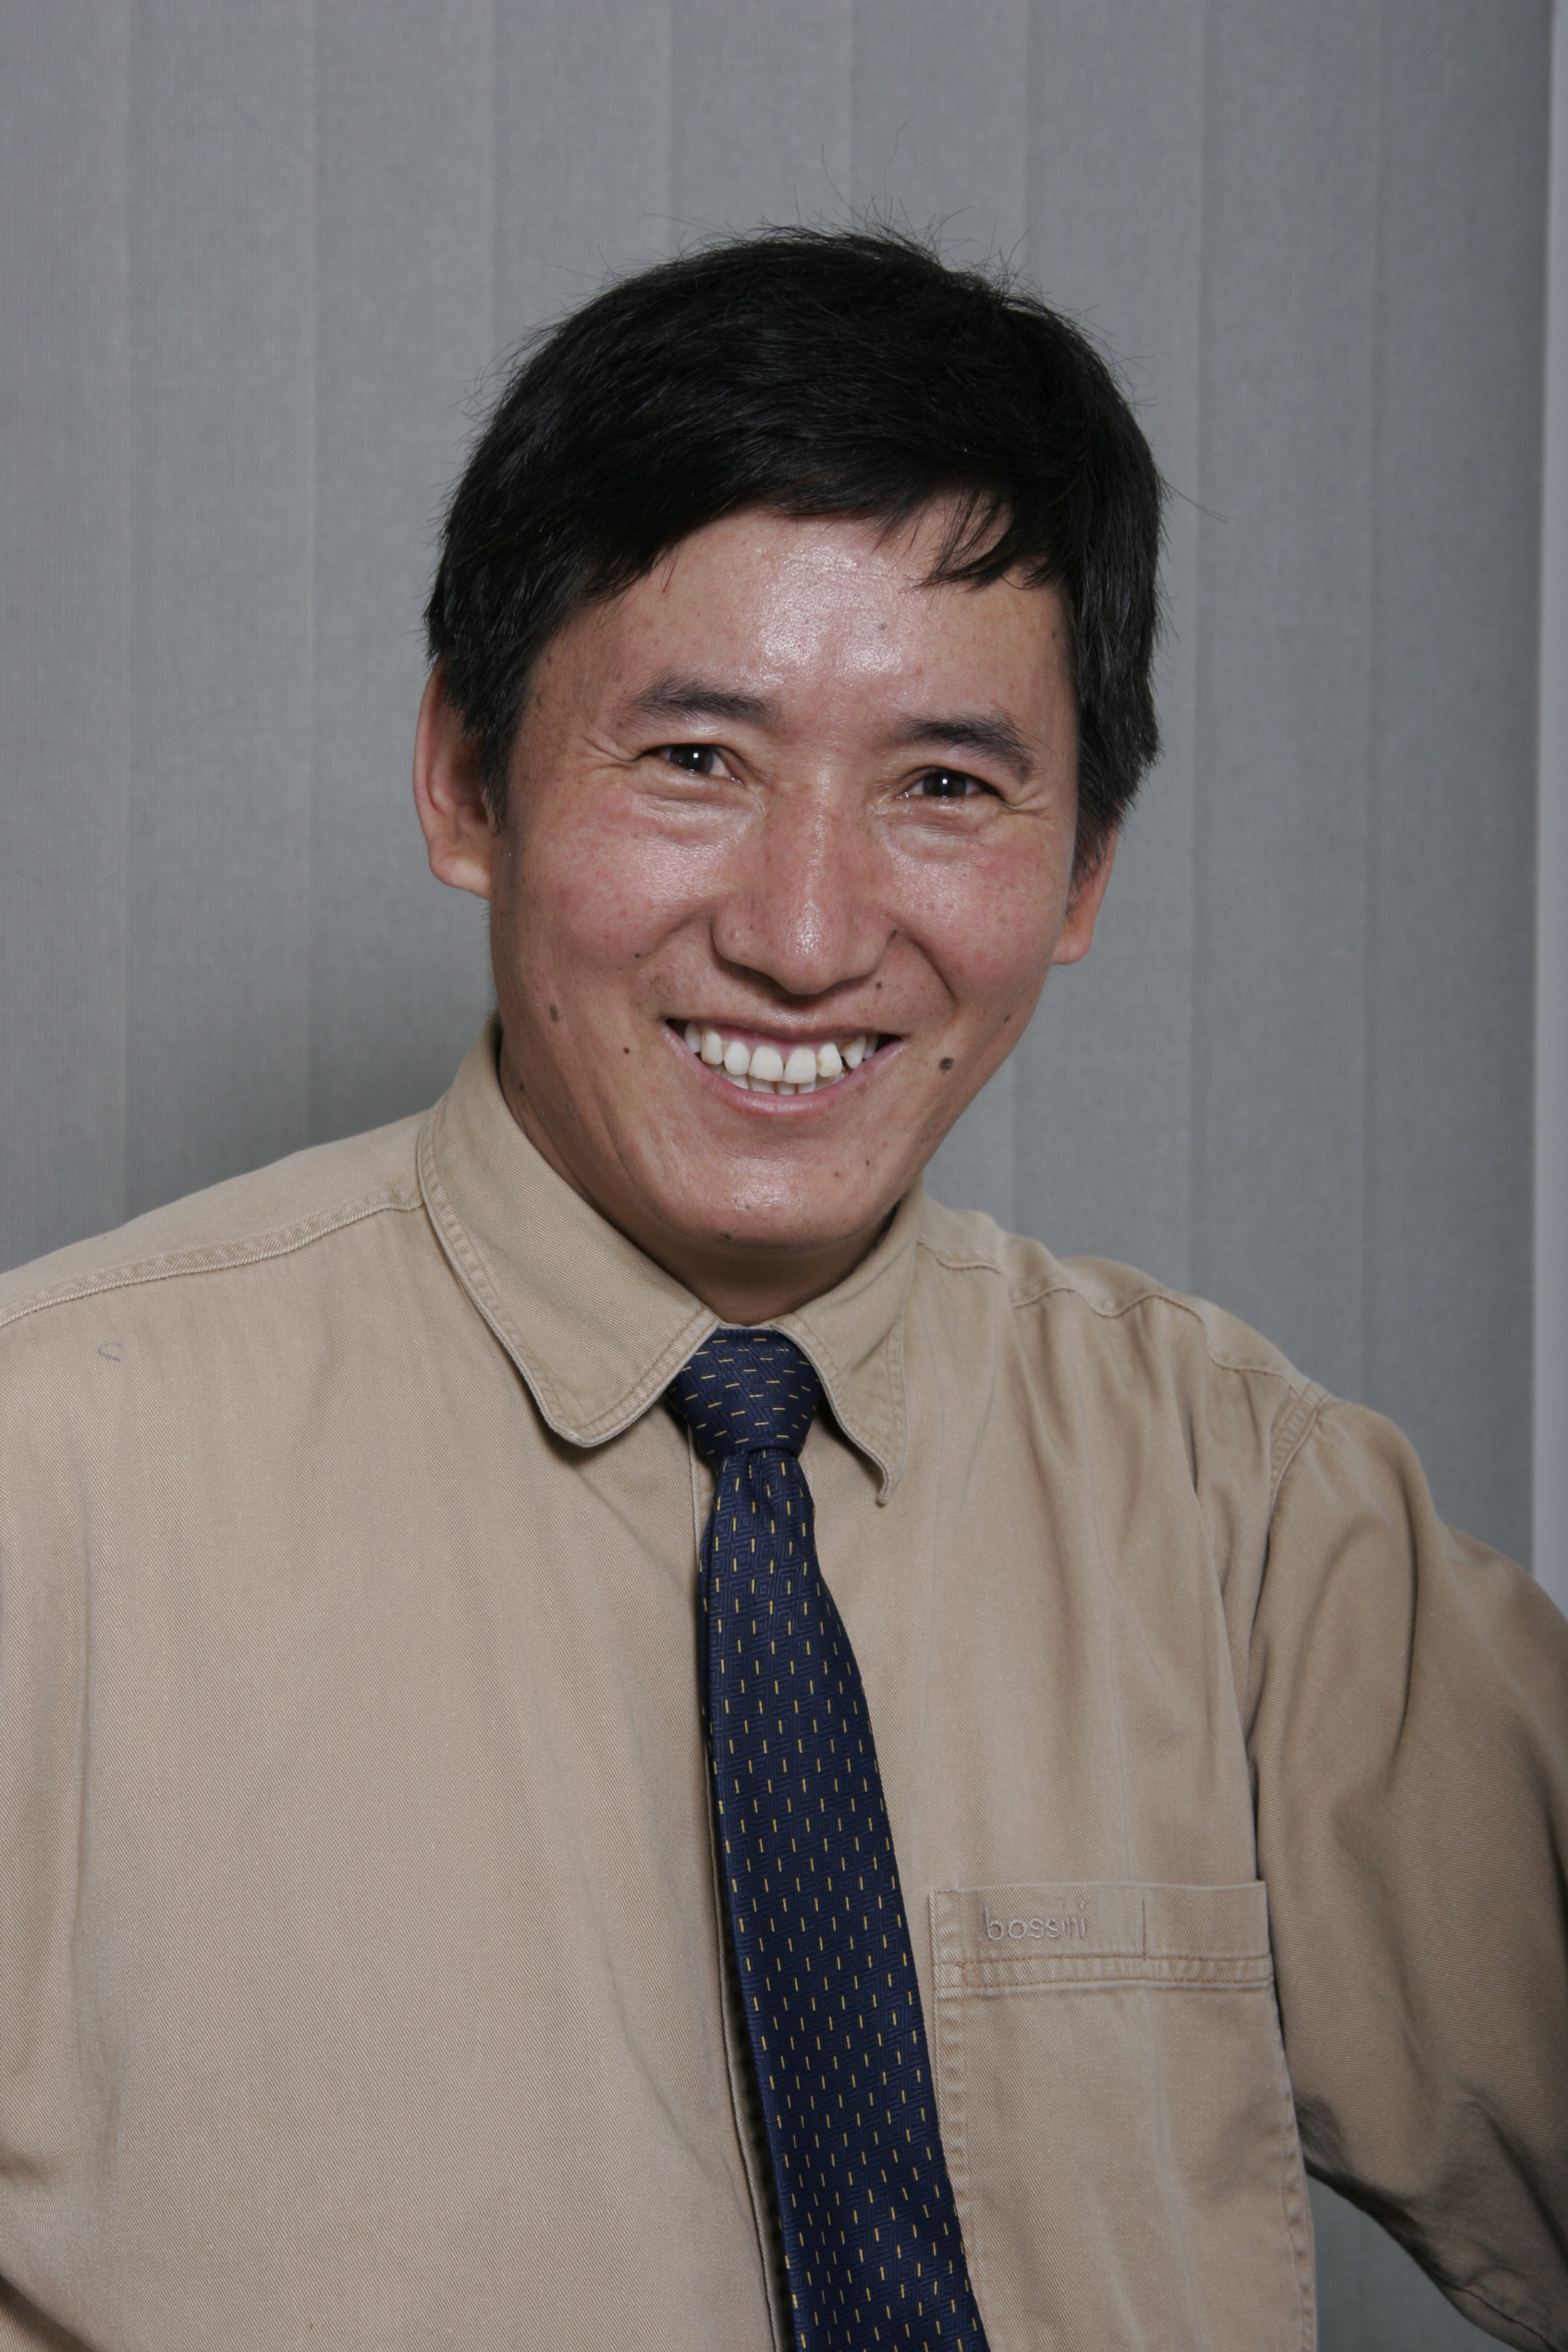 Lobsang Chophel